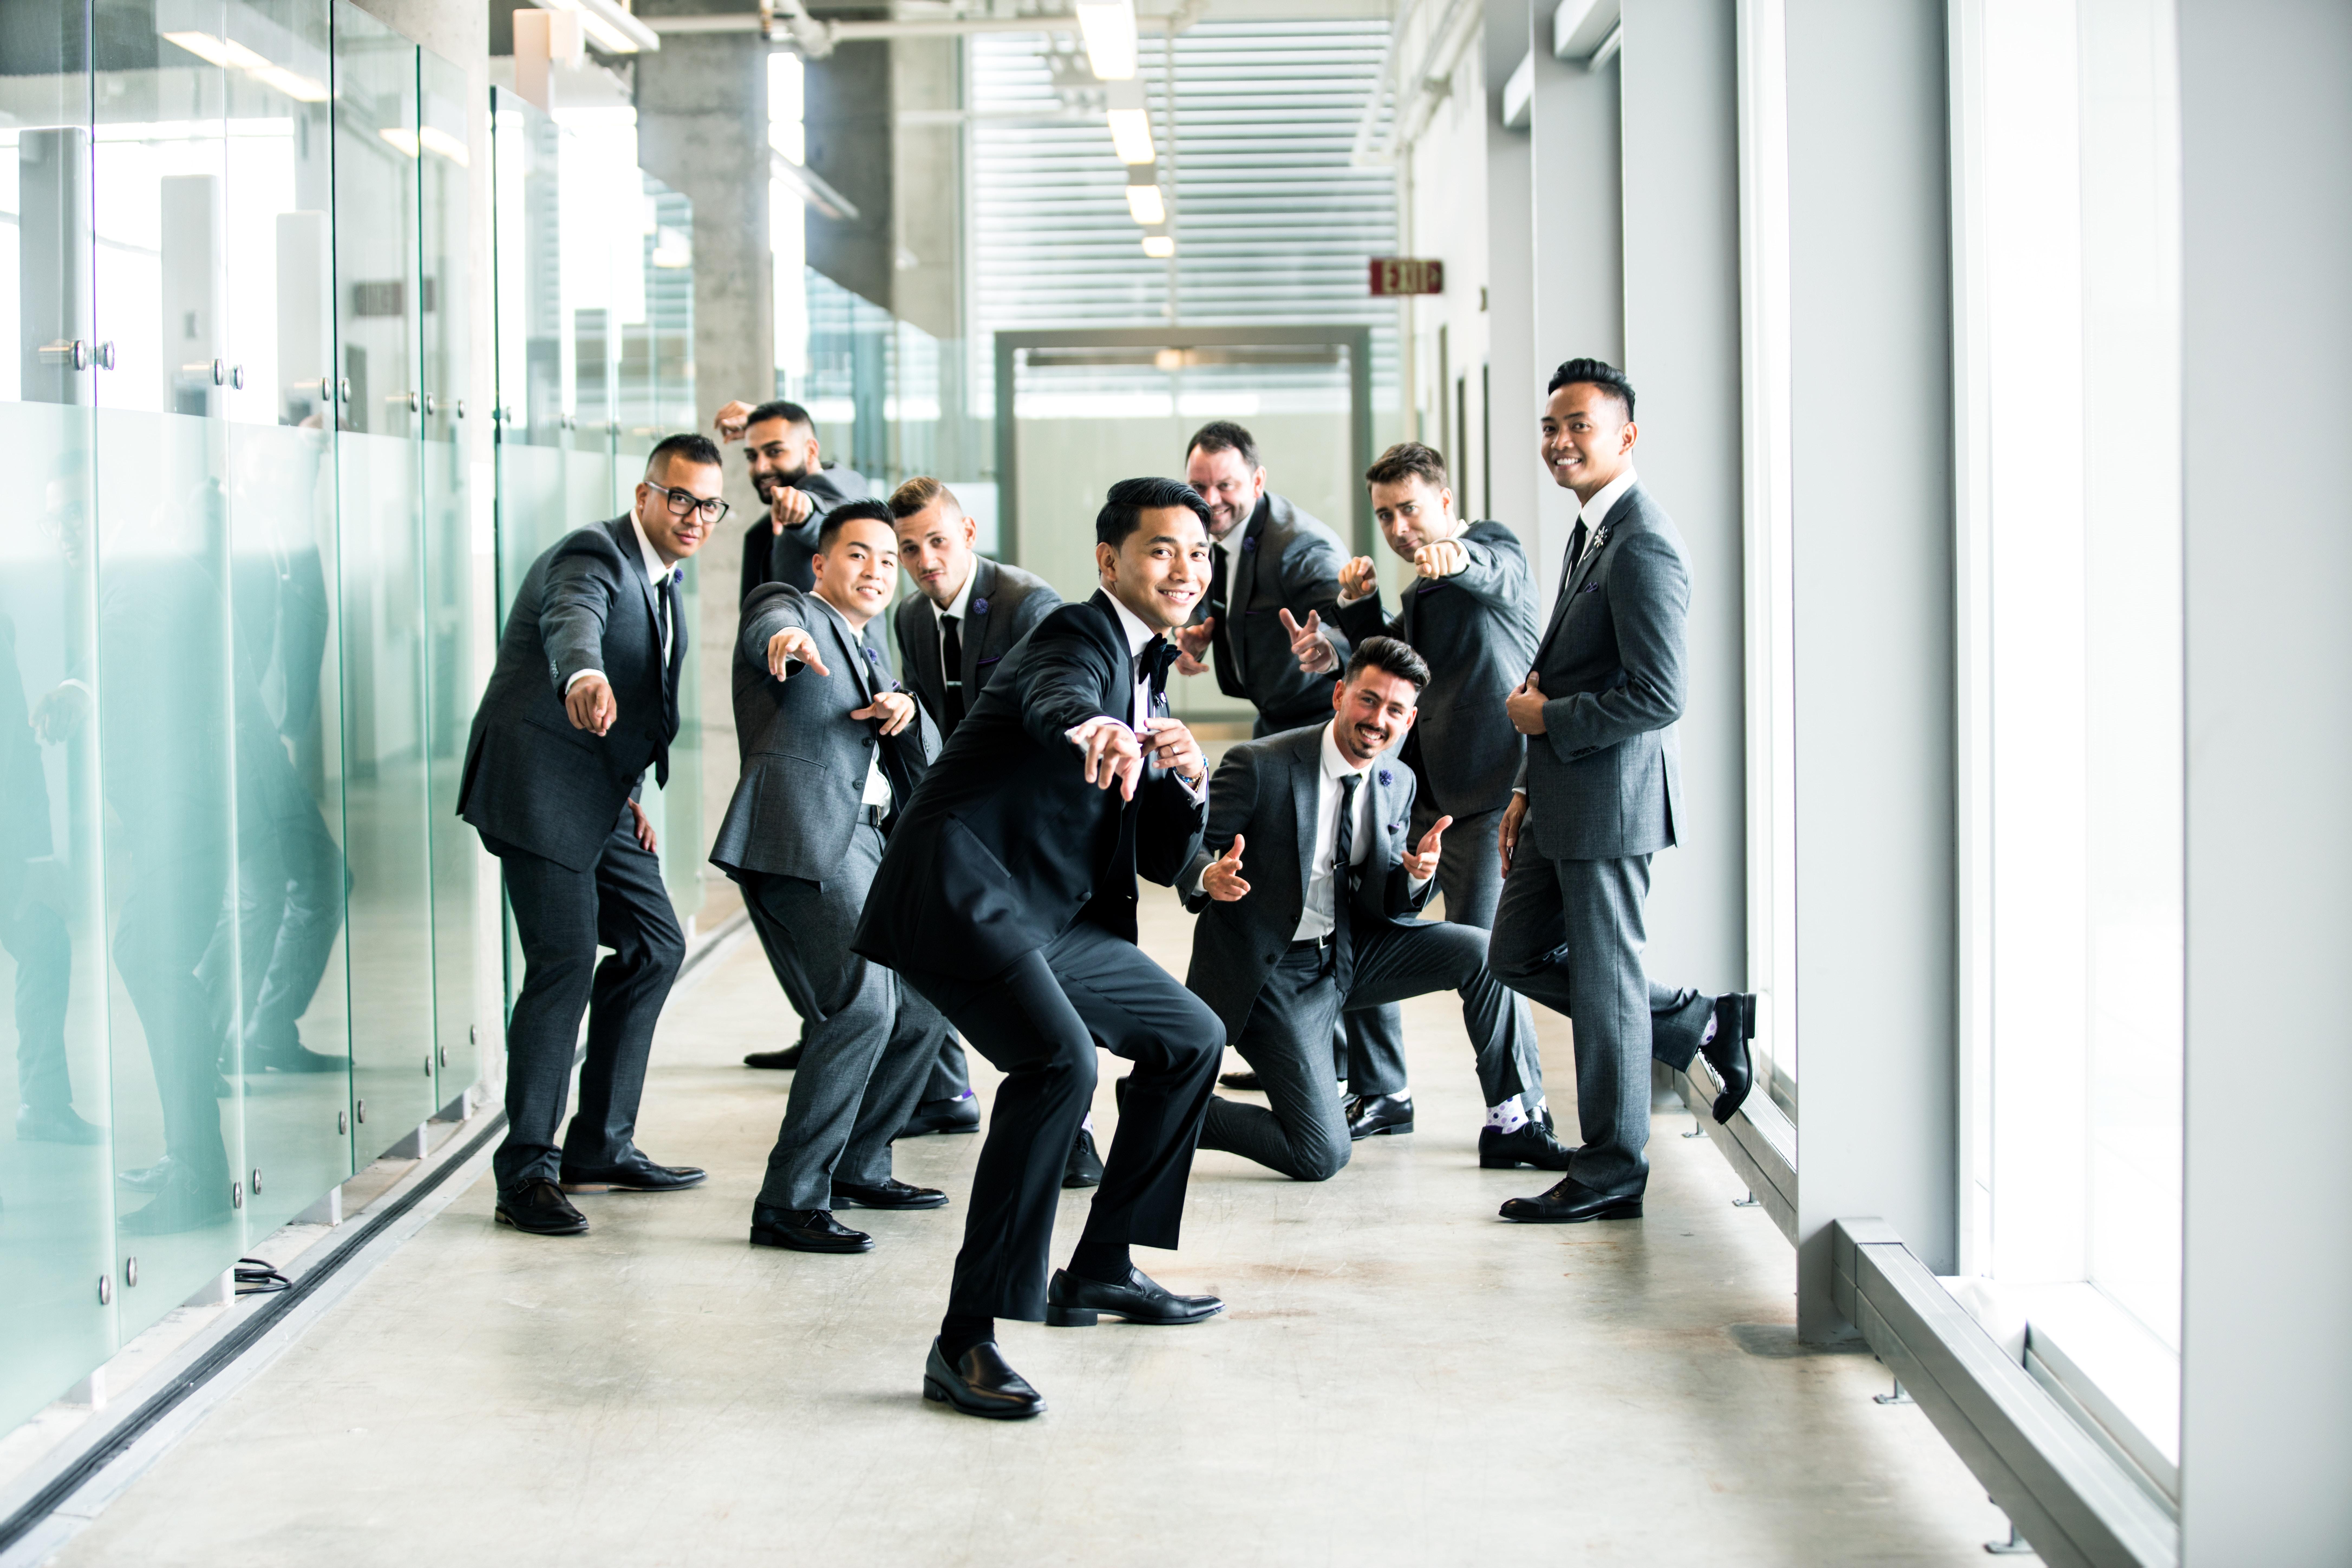 group of man standing in hallway